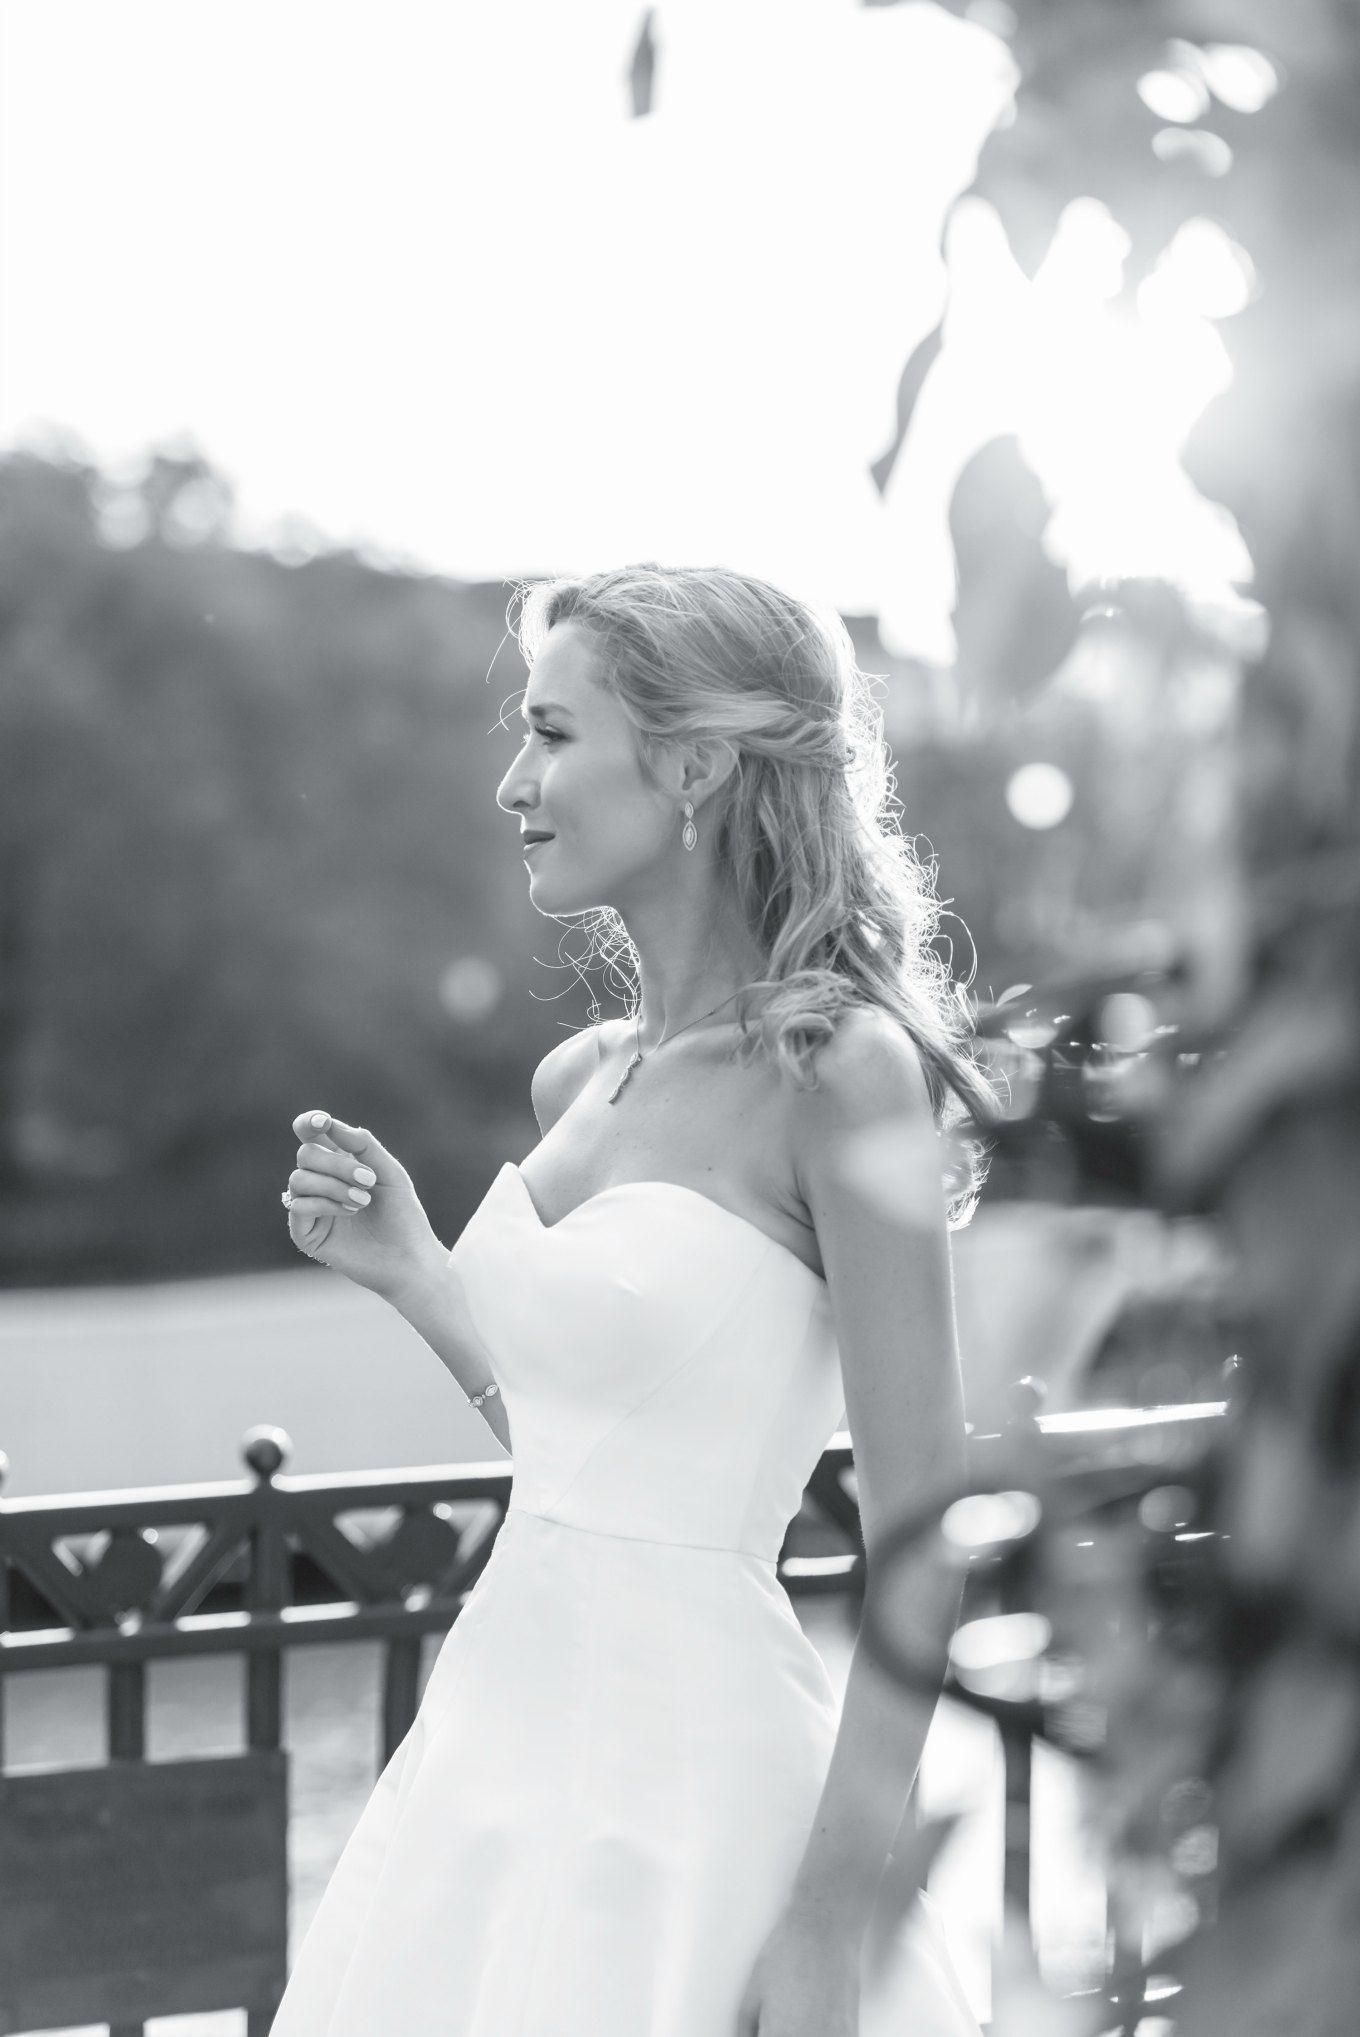 oscar-de-la-renta-sweetheart-strapless-fit-flare-wedding-dress-gown-classic-style-mary-orton14